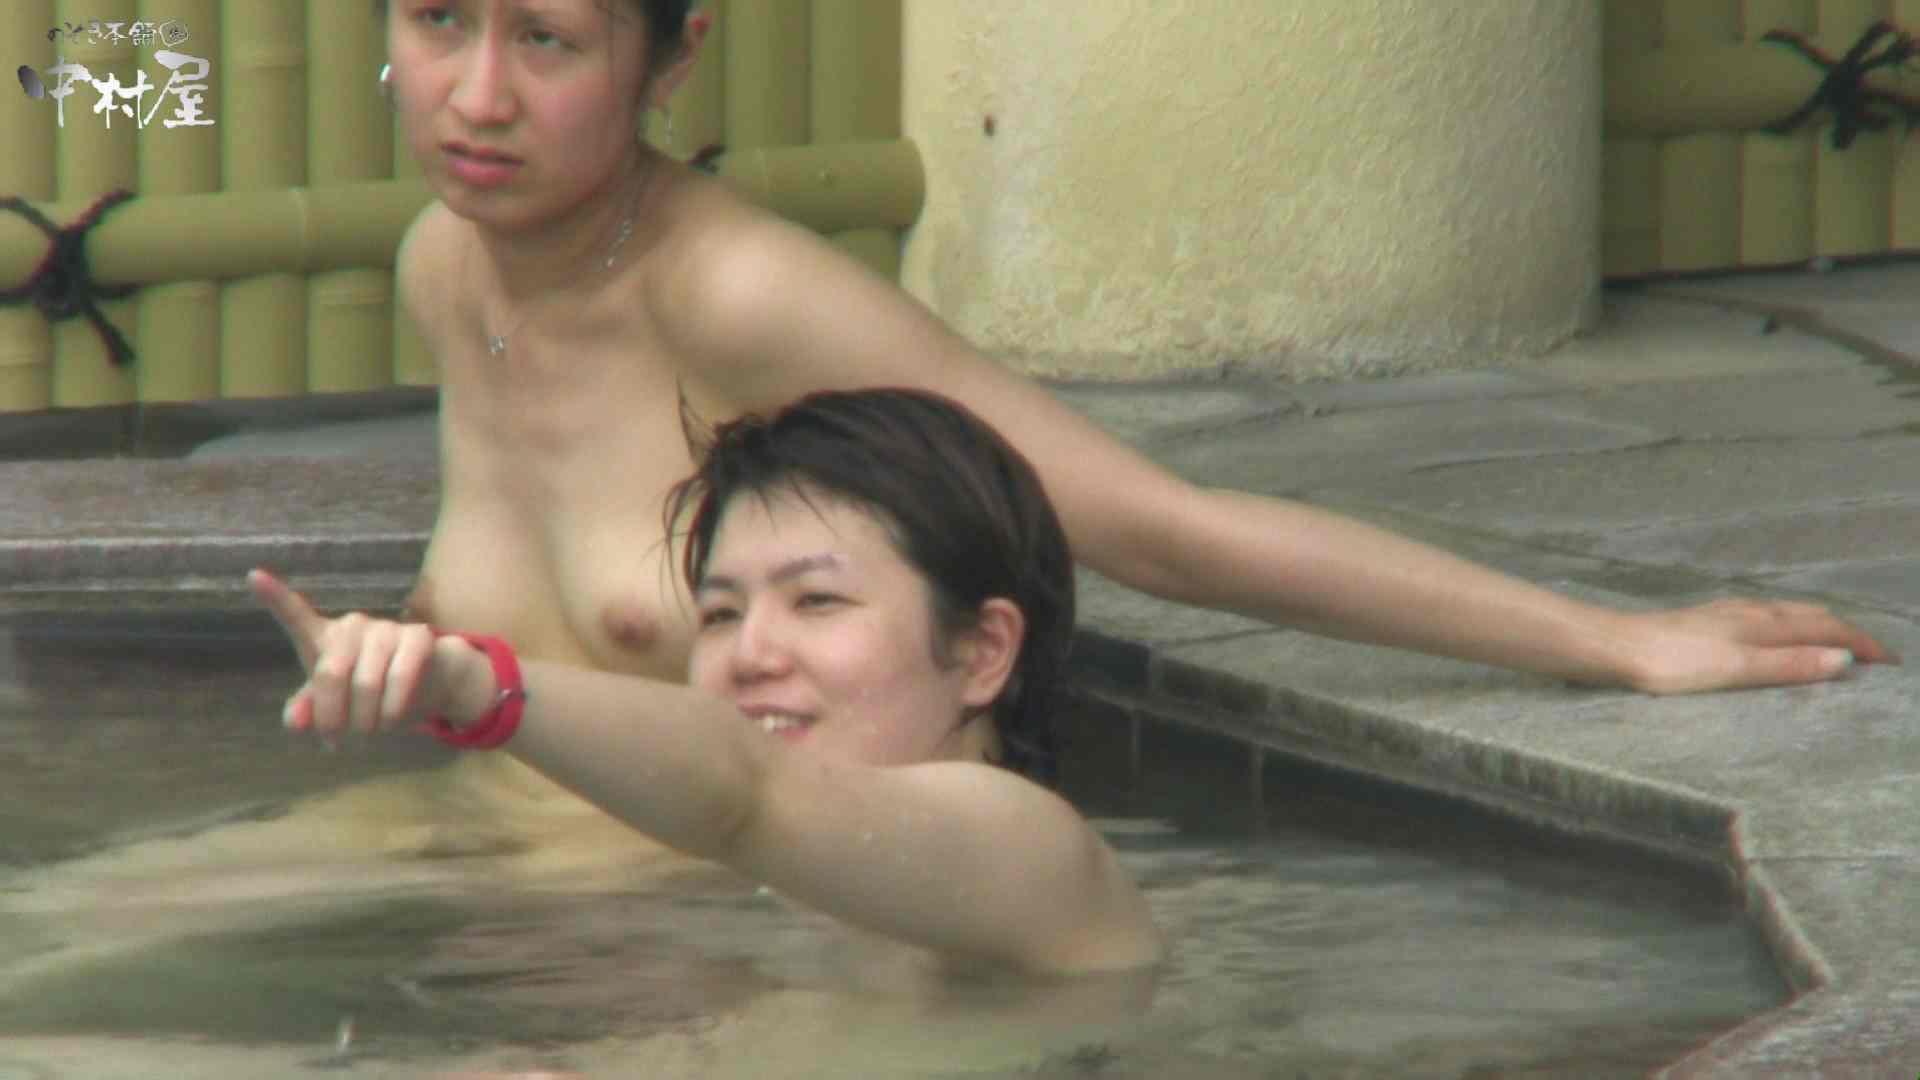 Aquaな露天風呂Vol.945 露天風呂突入 AV無料動画キャプチャ 75pic 35